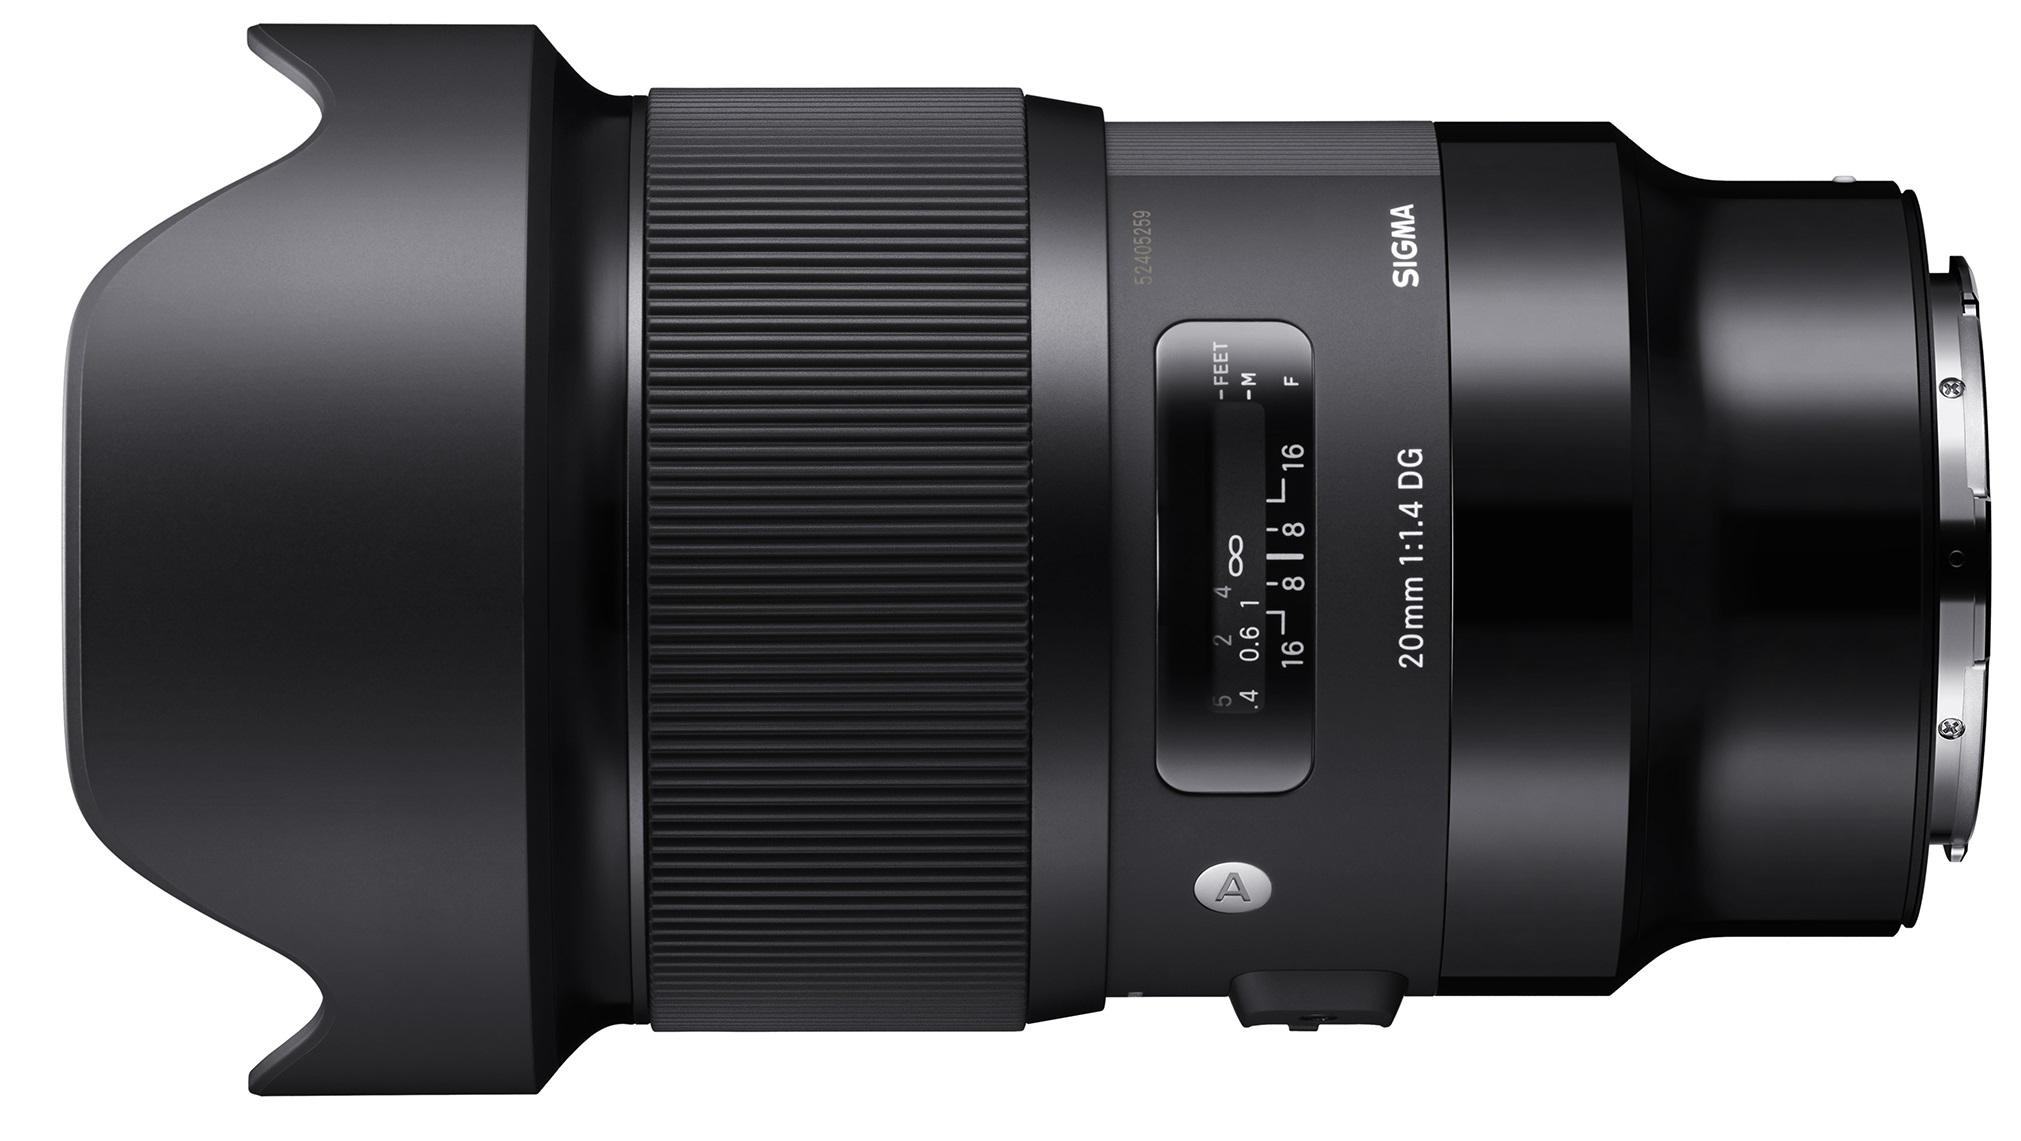 SIGMA 20 mm f/1,4 DG HSM Art pro Panasonic/Leica L